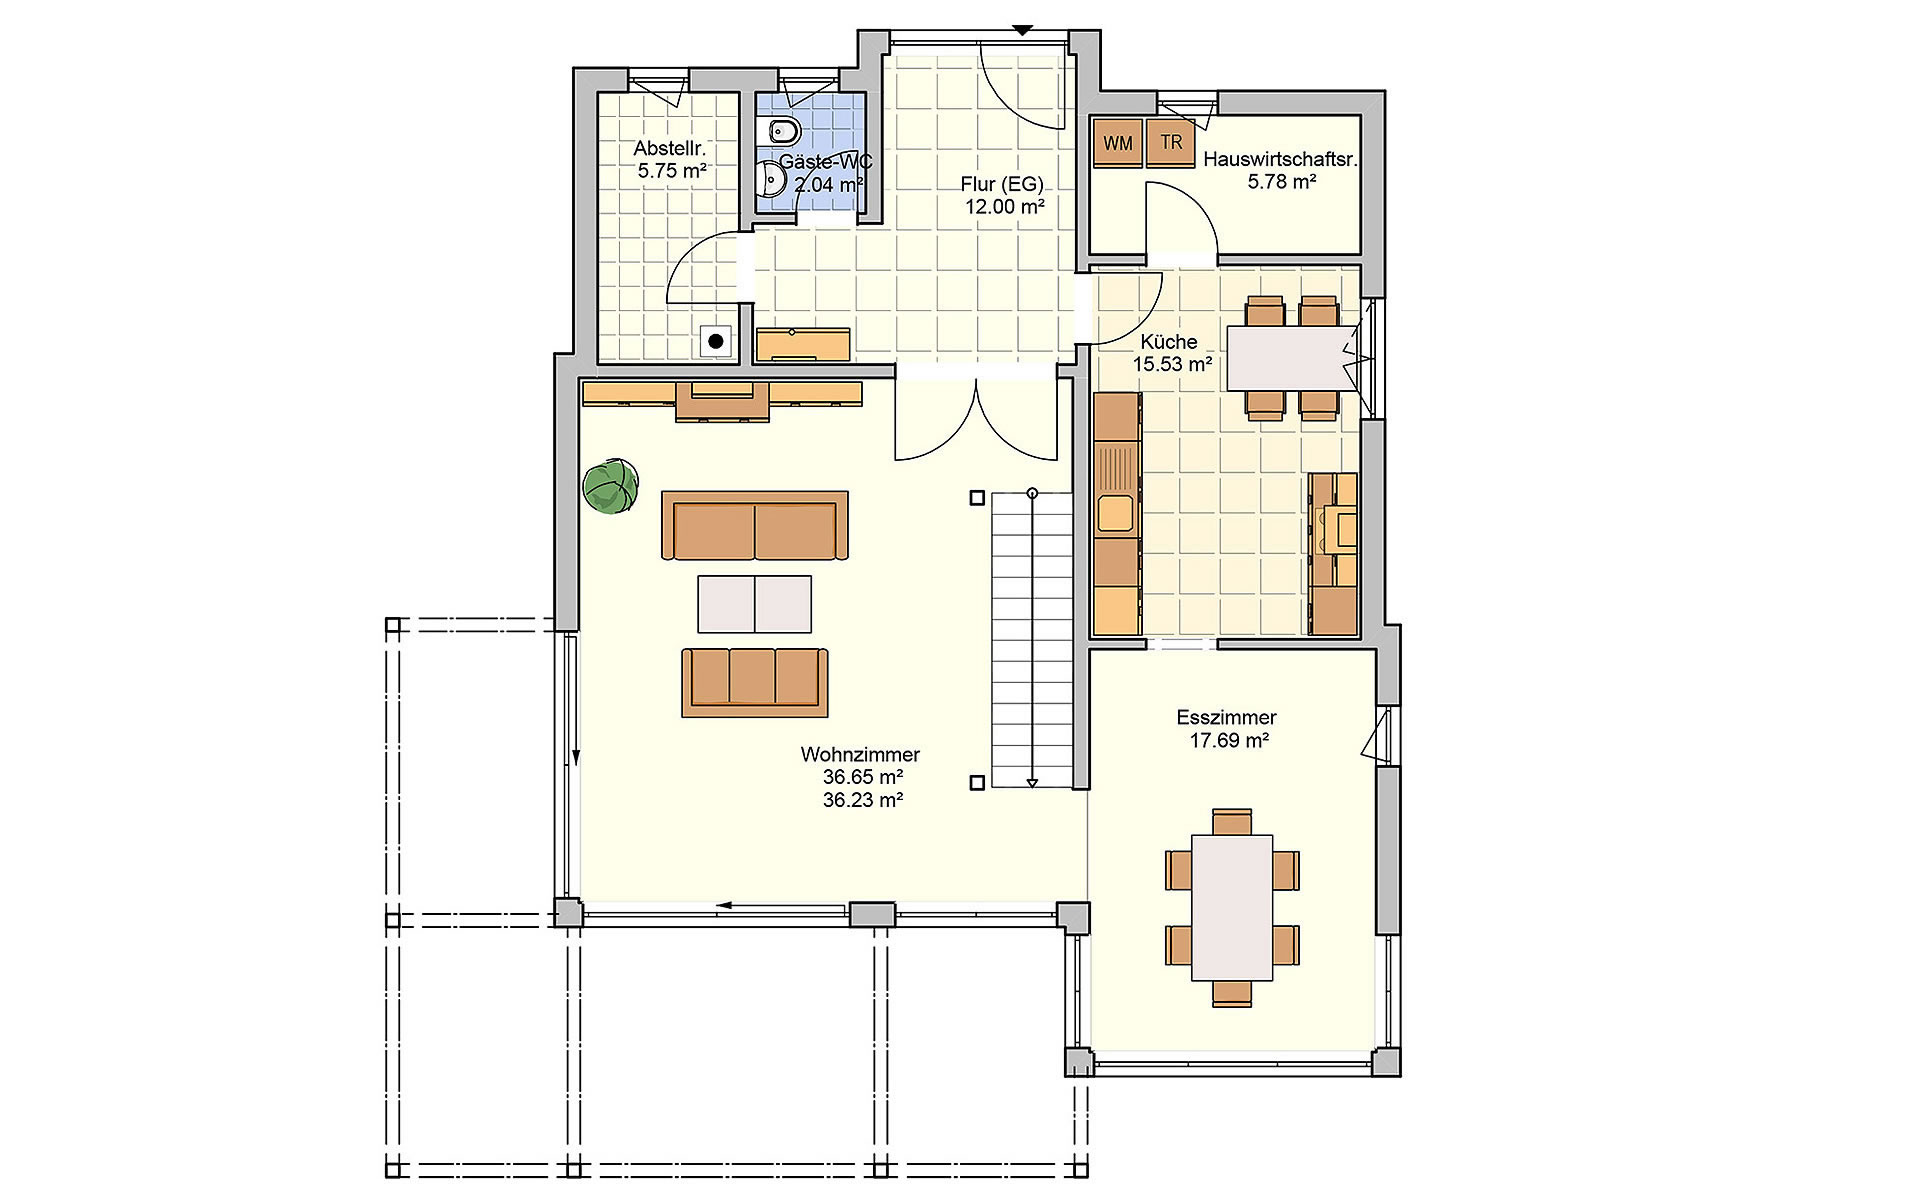 Erdgeschoss Bela von Fingerhut Haus GmbH & Co. KG